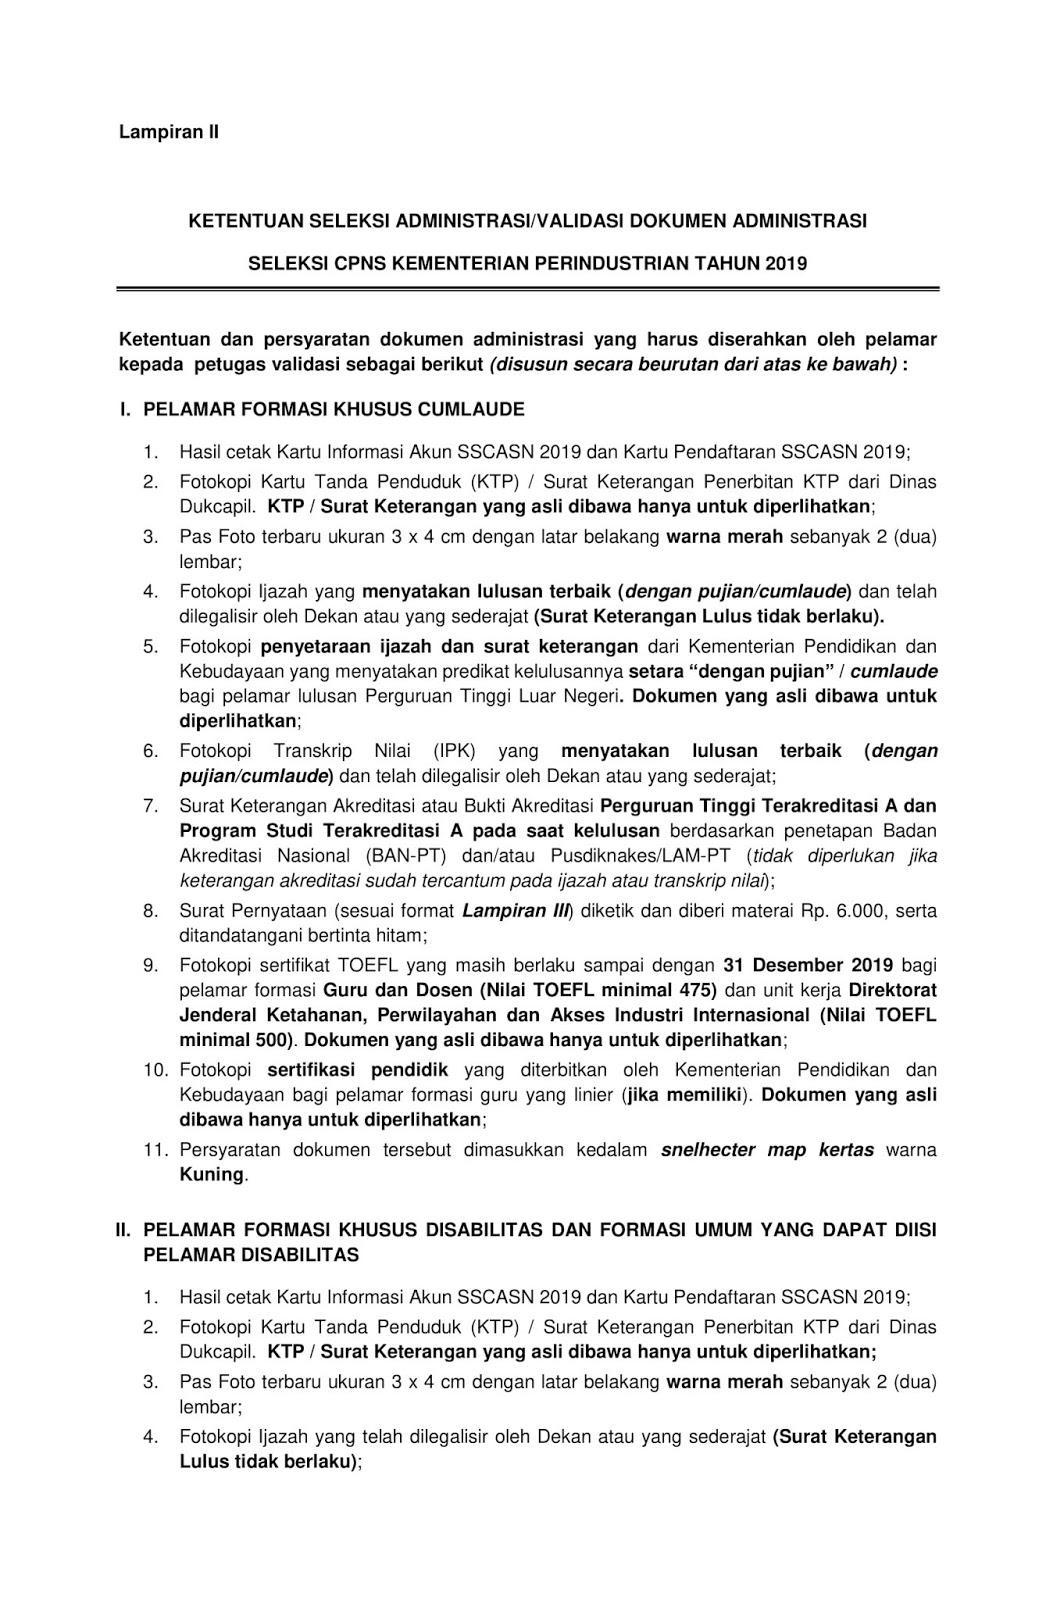 Pengumuman Dan Ketentuan Pelaksanaan Seleksi Administrasi Validasi Dokumen Administrasi Cpns Kementerian Perindustrian Tahun Anggaran 2019 Rekrutmen Lowongan Kerja Bulan Oktober 2020